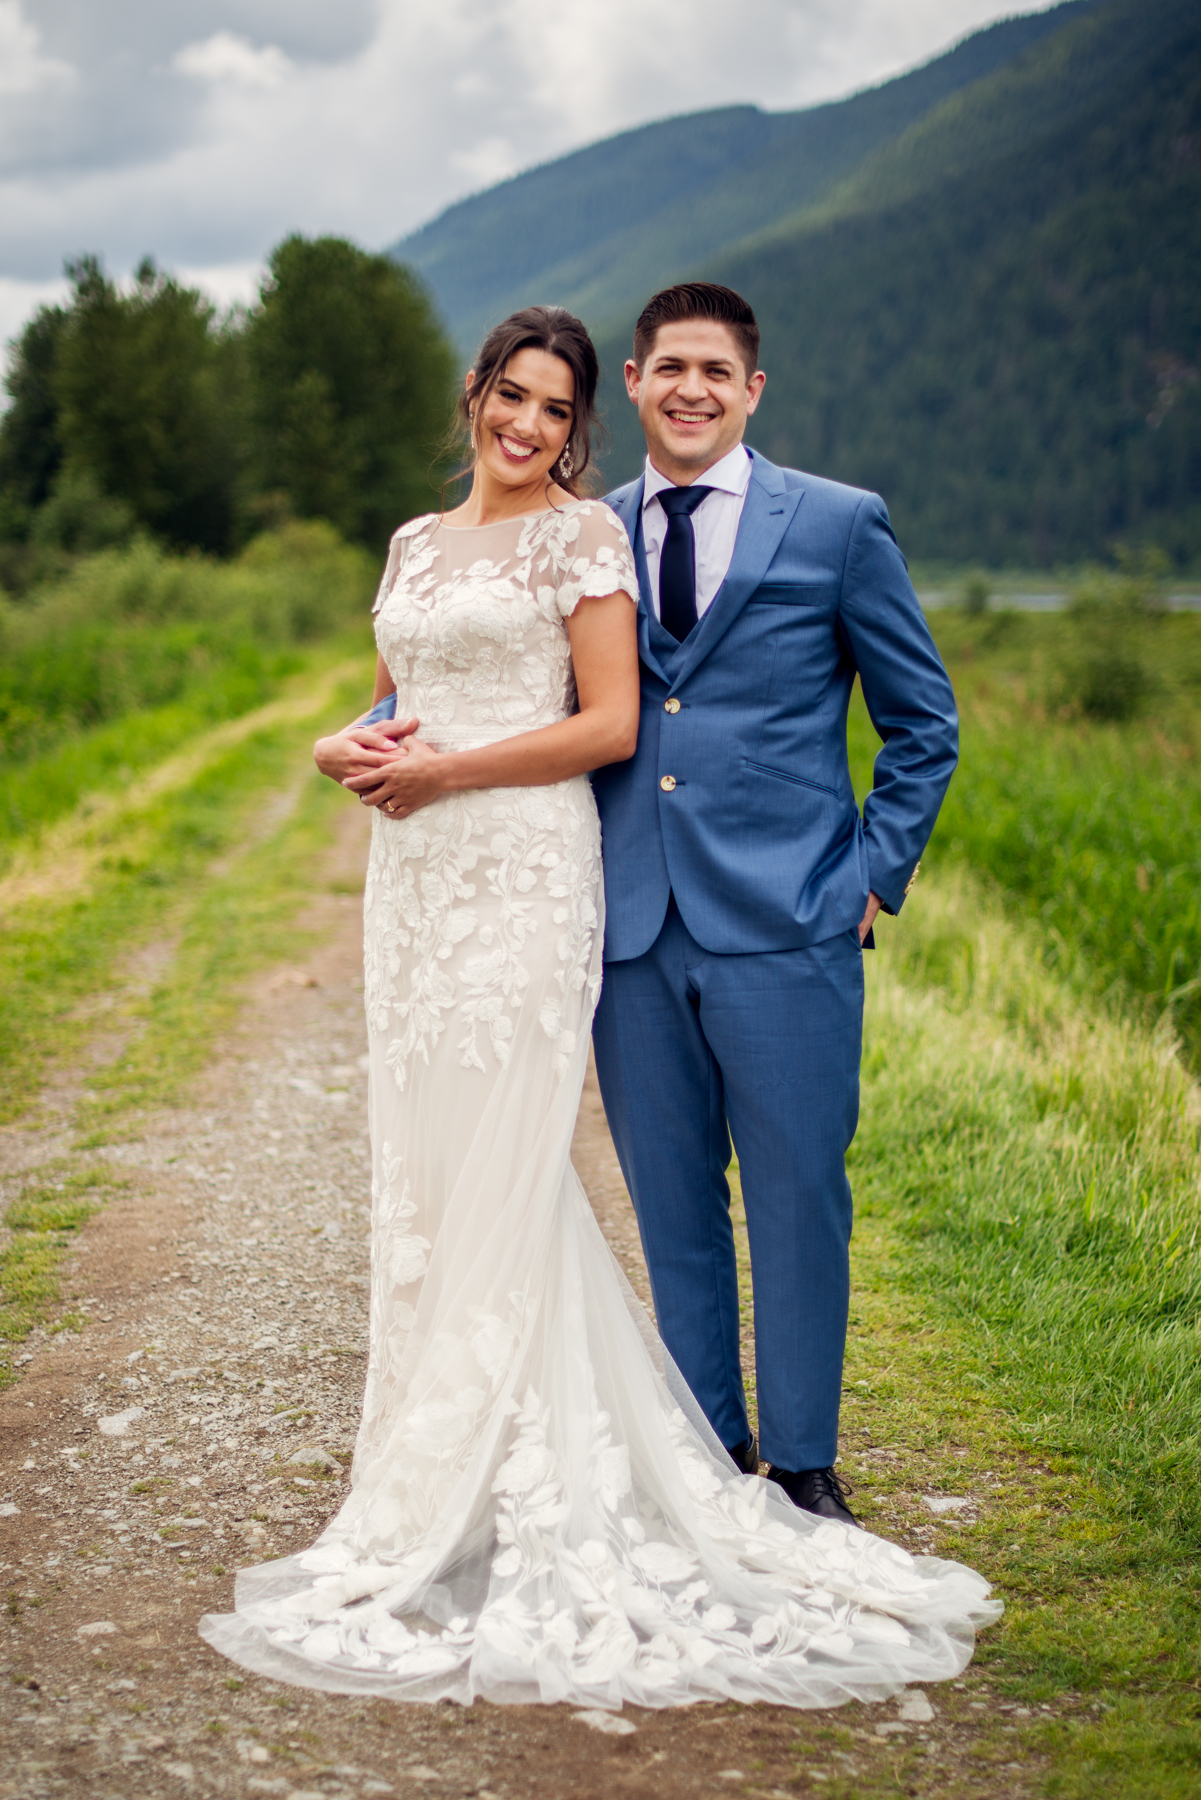 dp-wedding-web-032